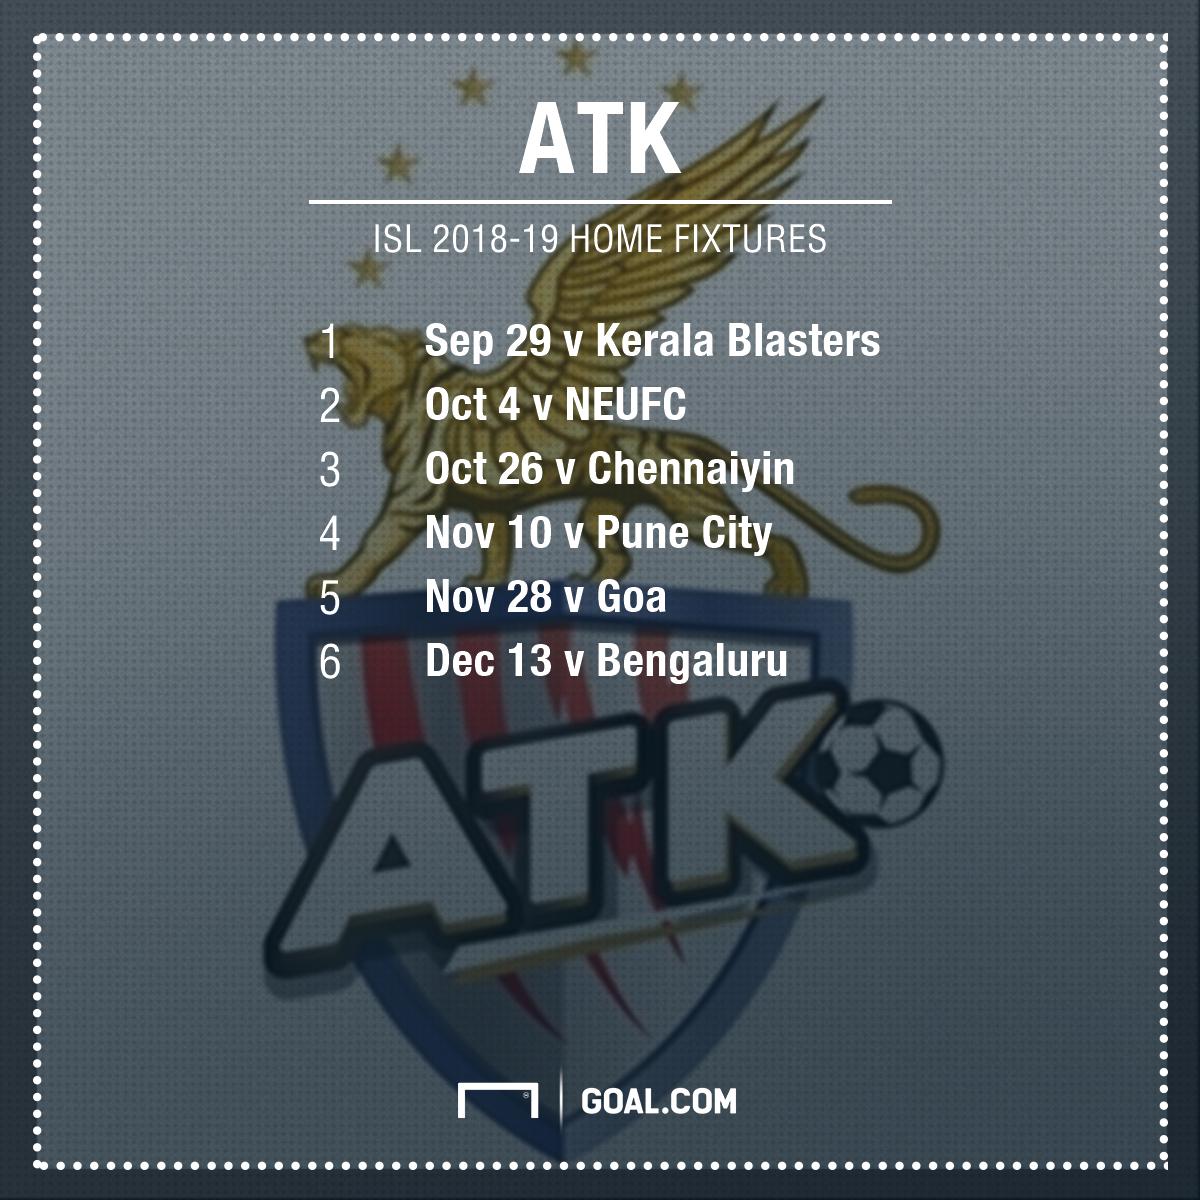 ATK home fixtures